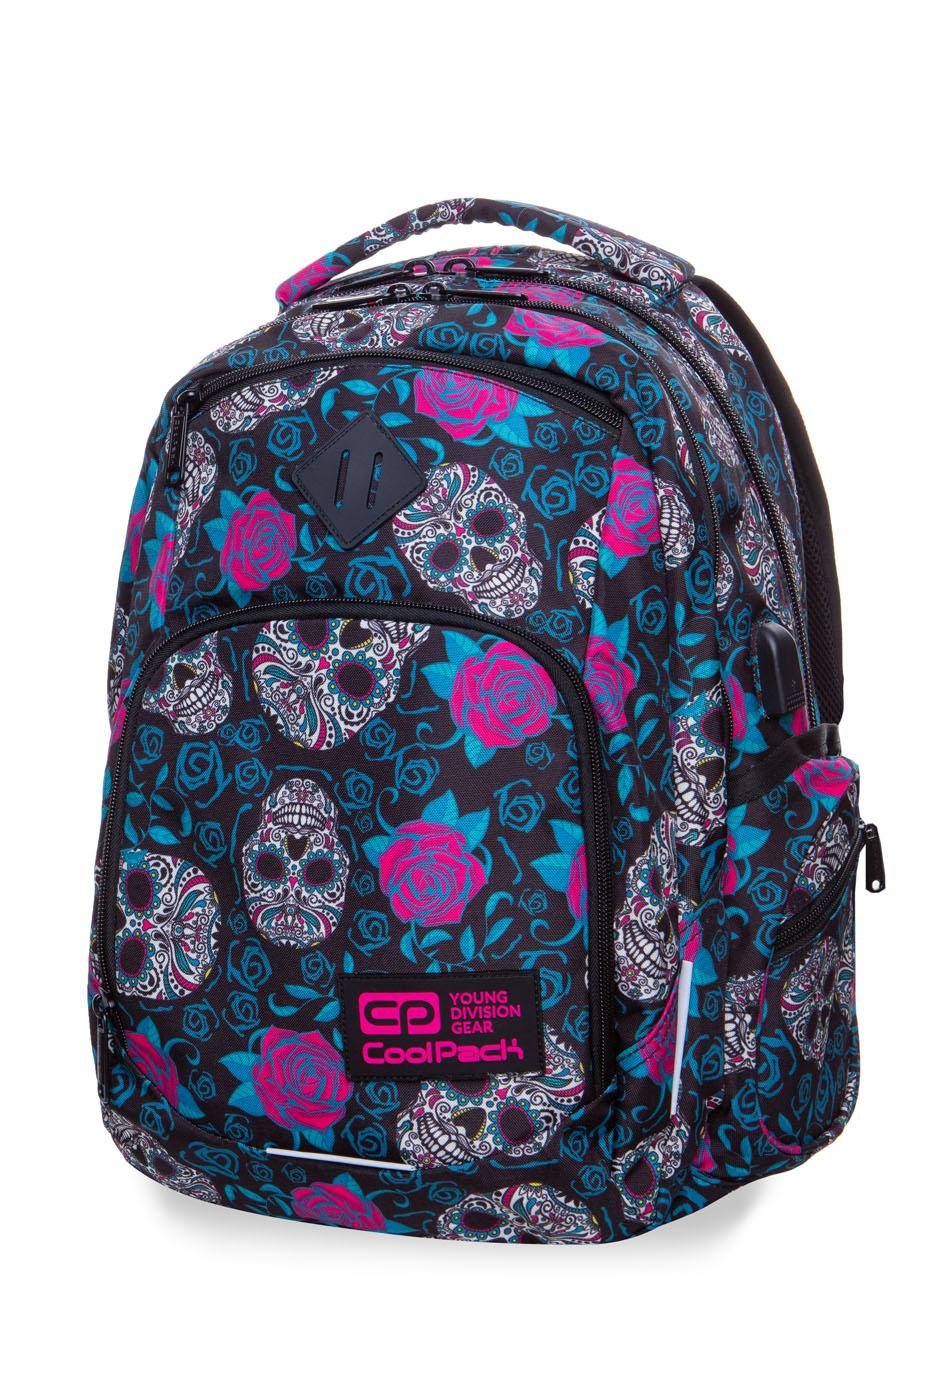 Coolpack   break  rygsæk   skulls & roses